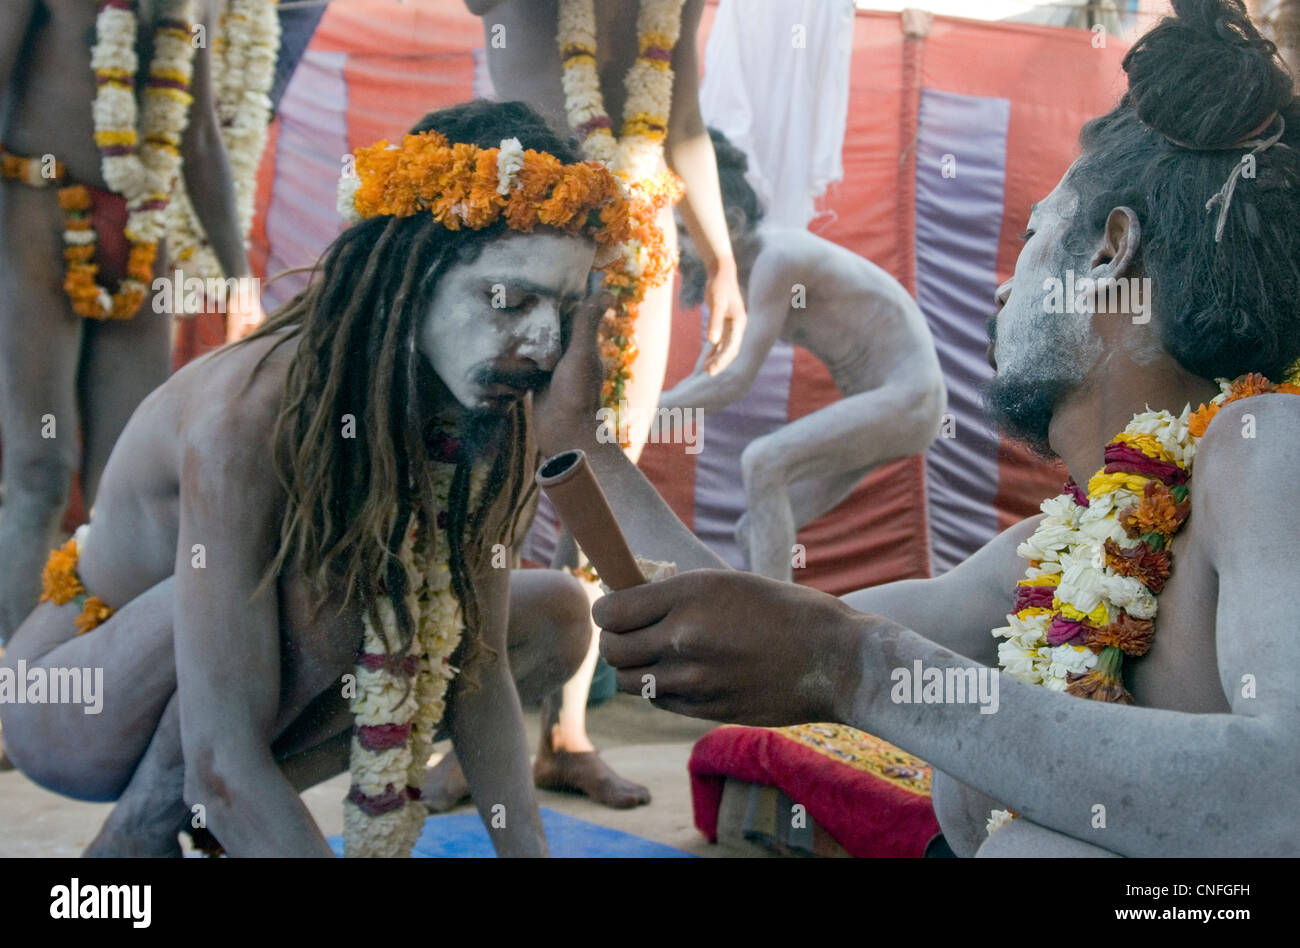 Sadhu getting ready for their bath during the Kumbh mela at Haridwar 2010 - Stock Image